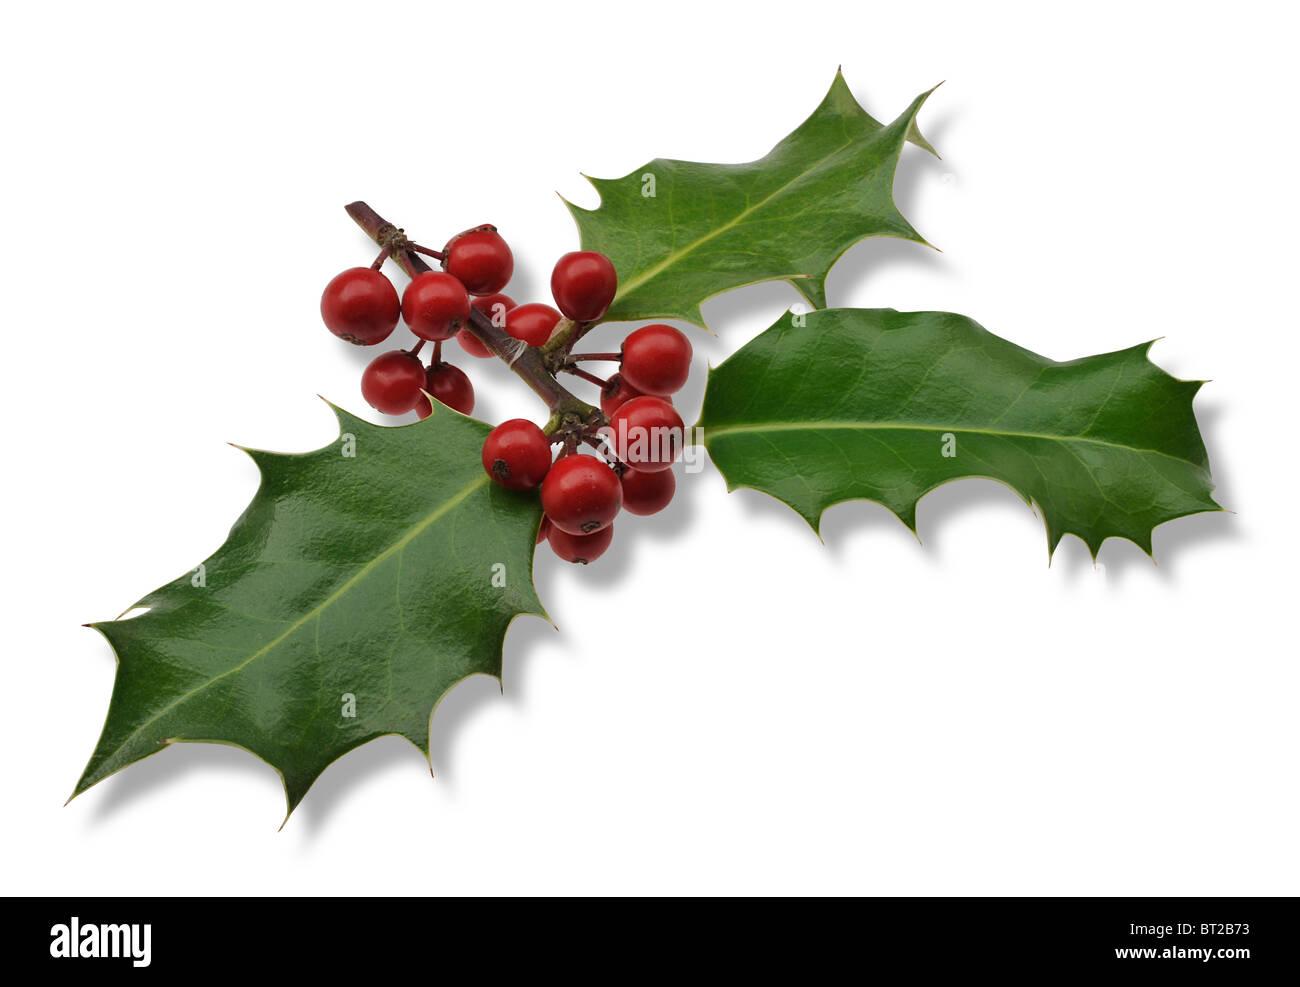 Christmas Holly - Stock Image